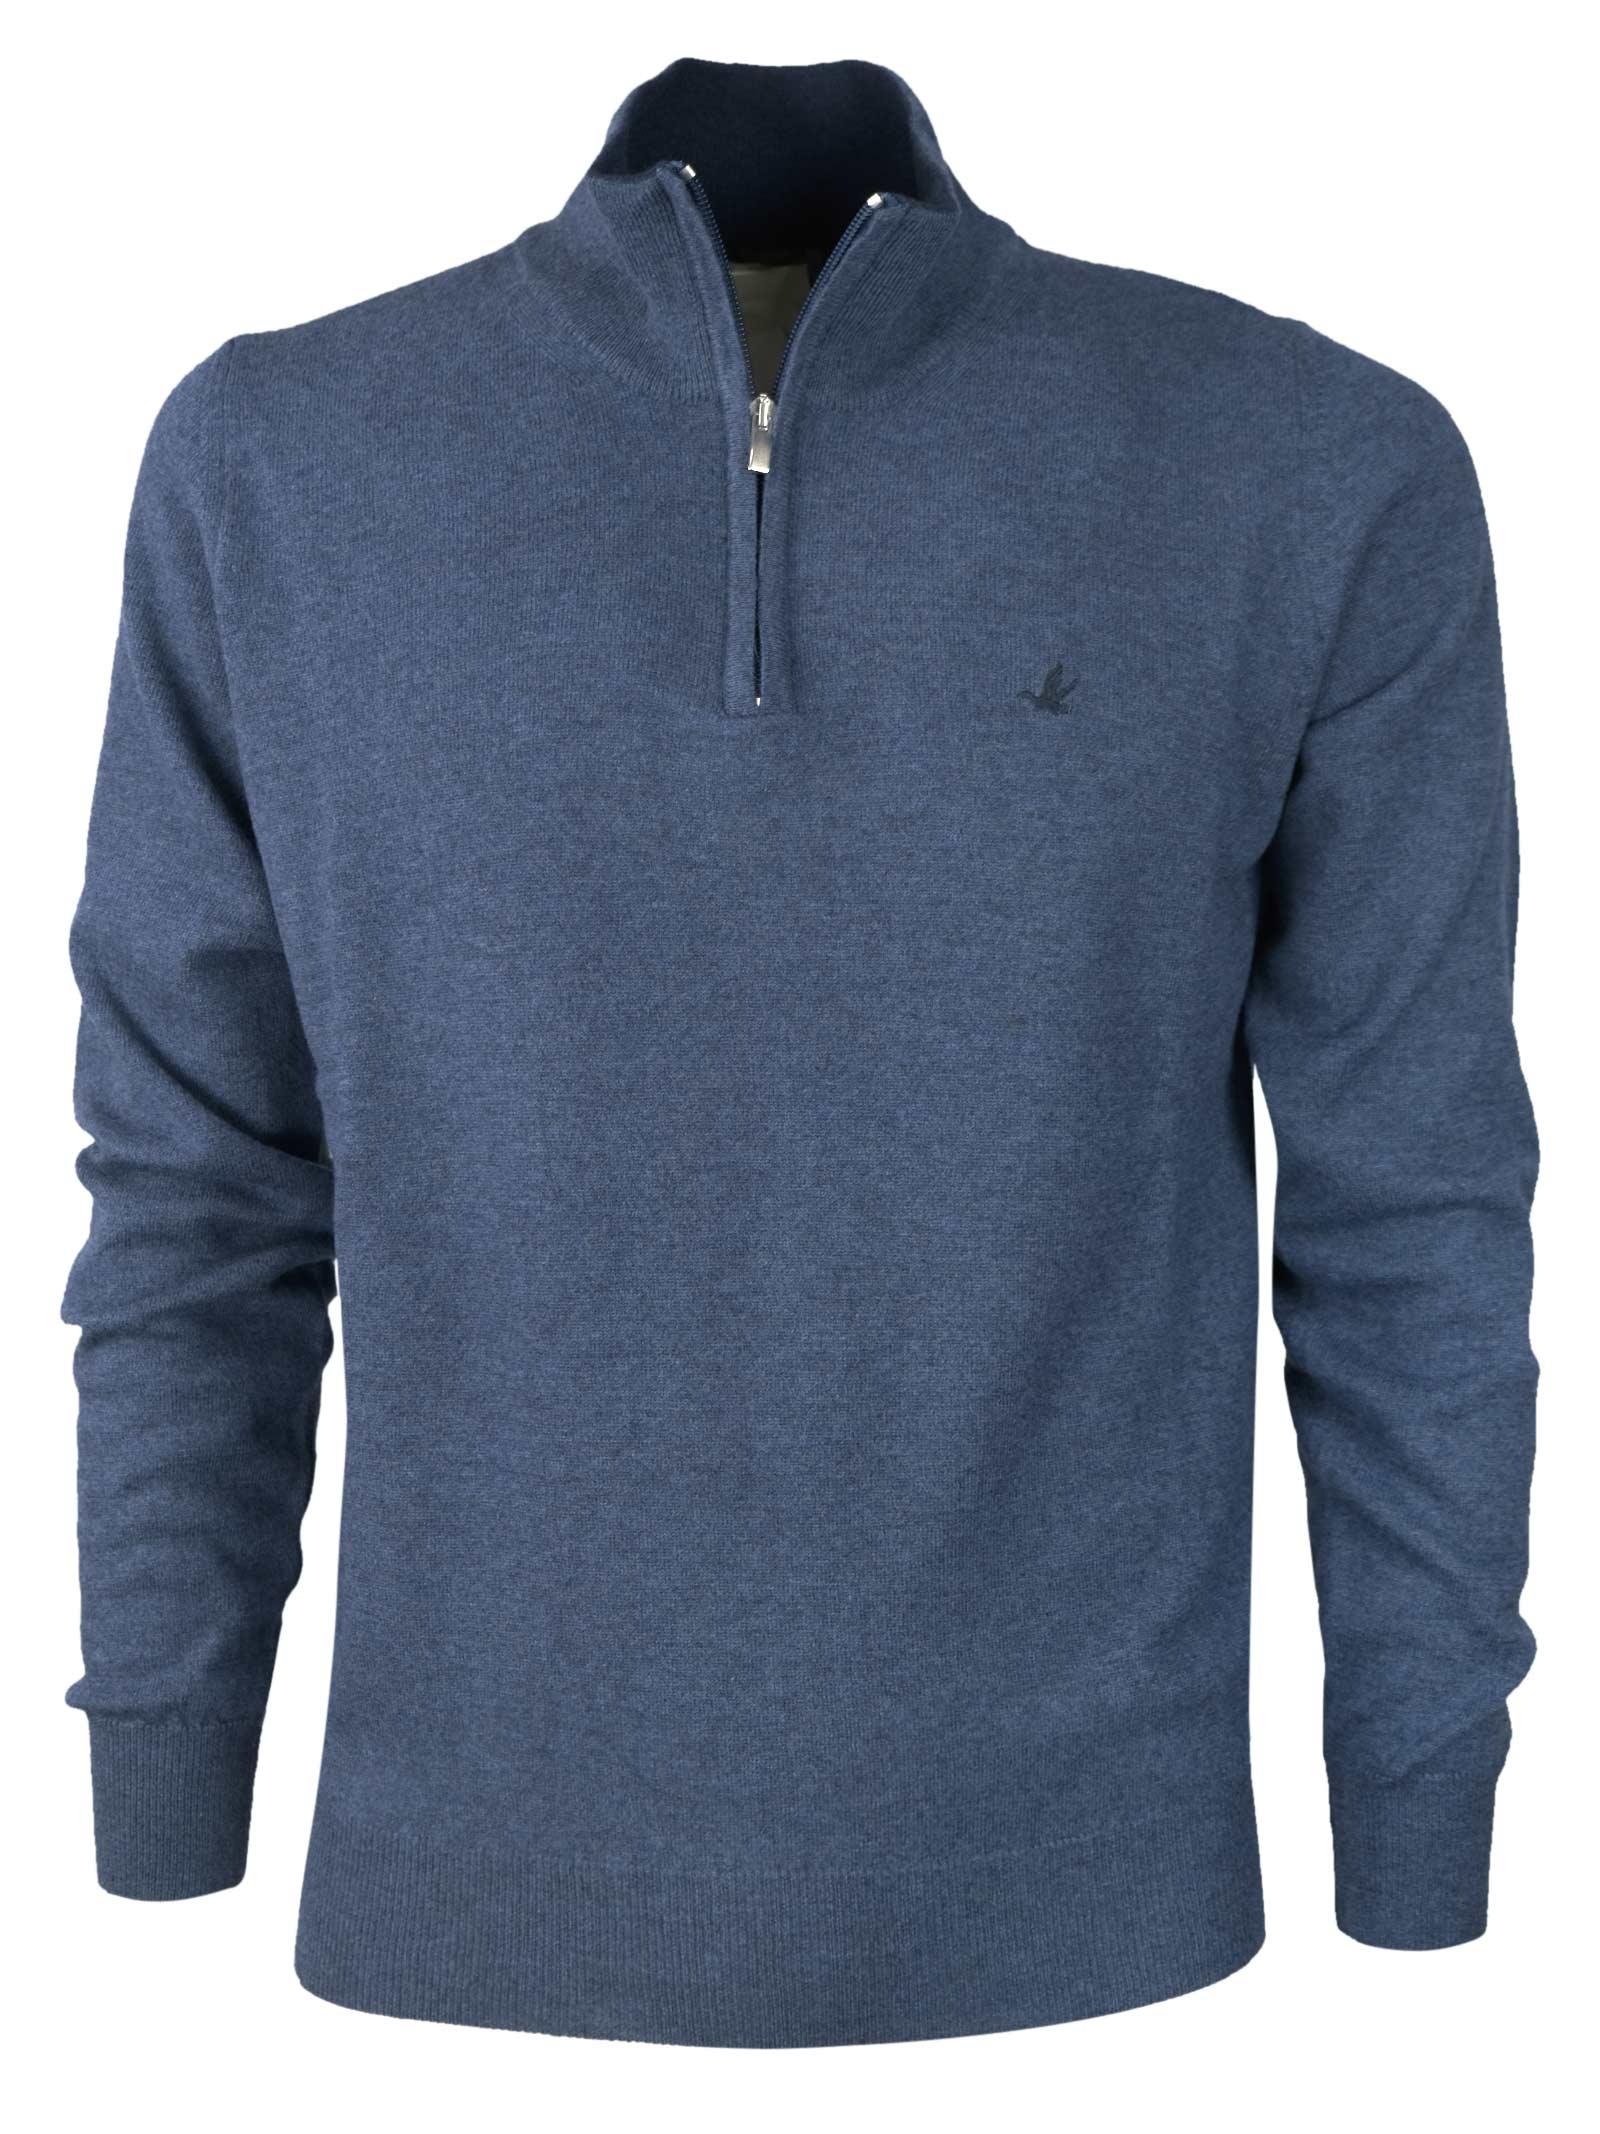 High collar sweater BROOKSFIELD   Knitwear   203E.K003154